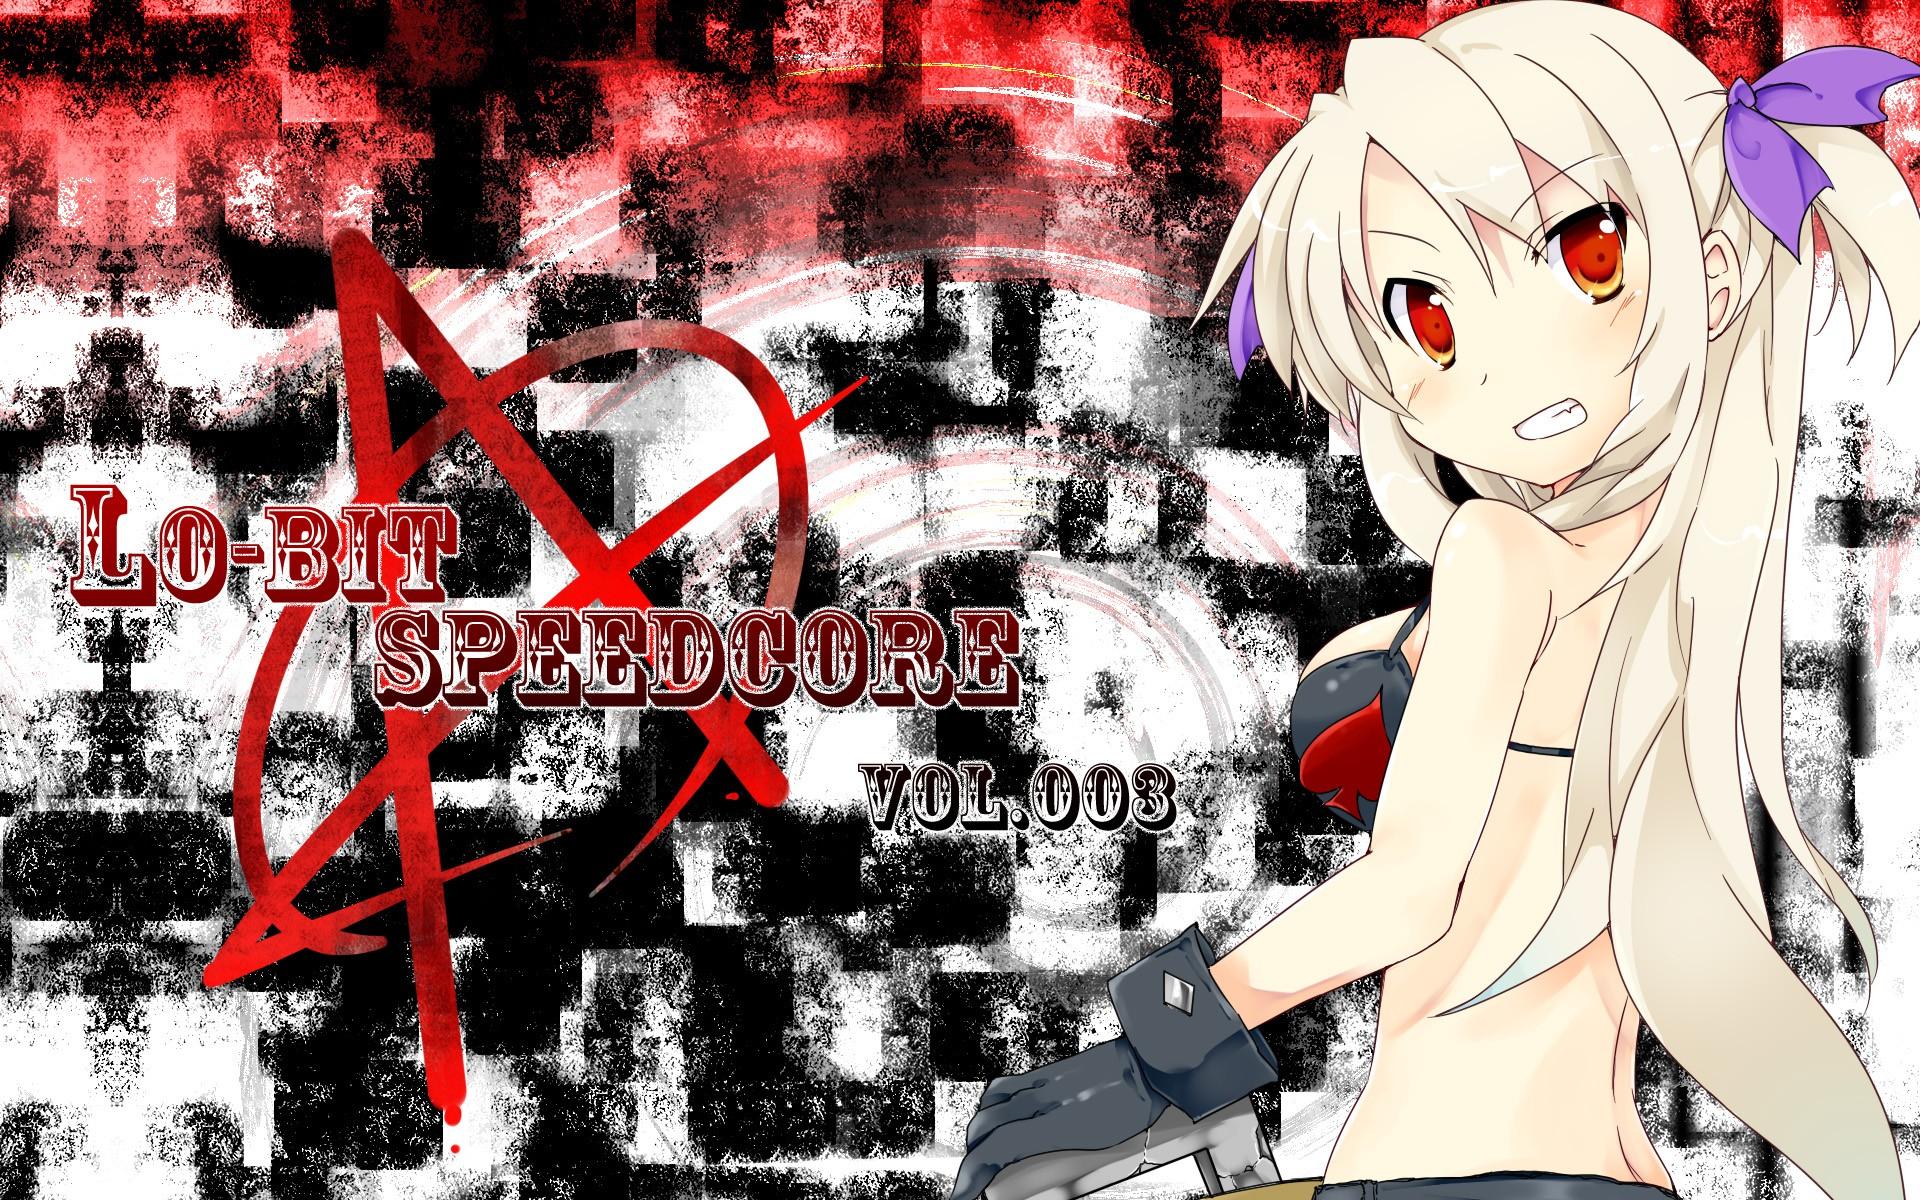 Anime 1920x1200 manga ecchi anime girls anime blonde red eyes